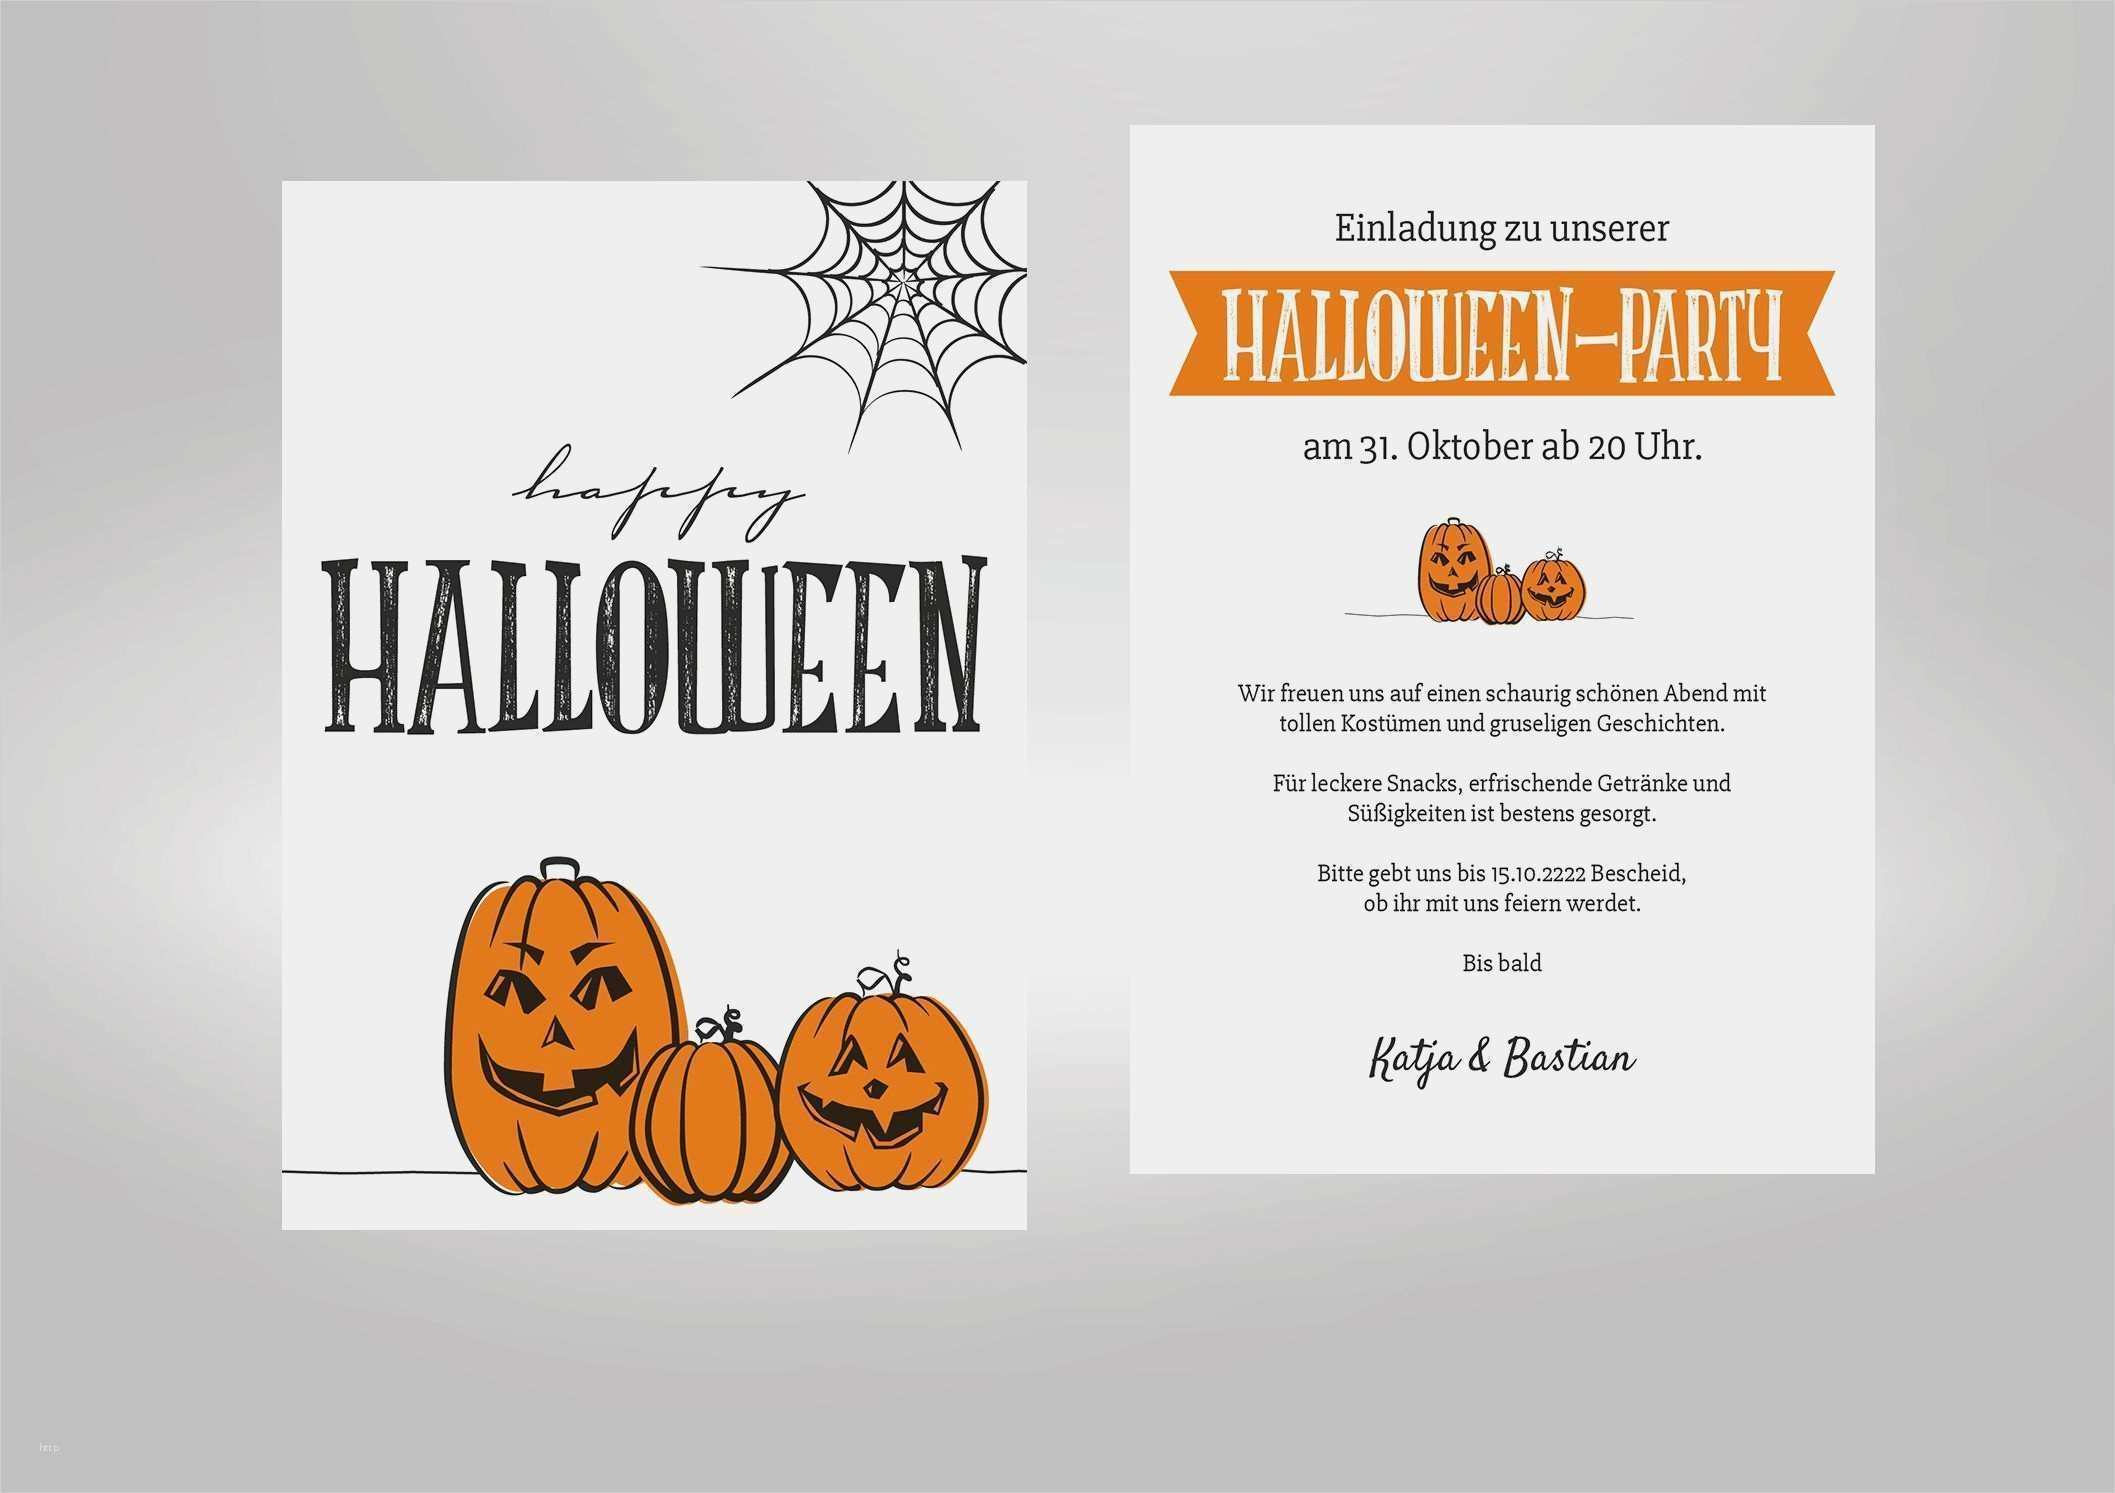 Einladung Halloween Party Vorlagen Kostenlos 31 Gut Einladung Halloween Party Vorlagen Kostenlos Wedding Invitations Invitations Christmas Party Invitations